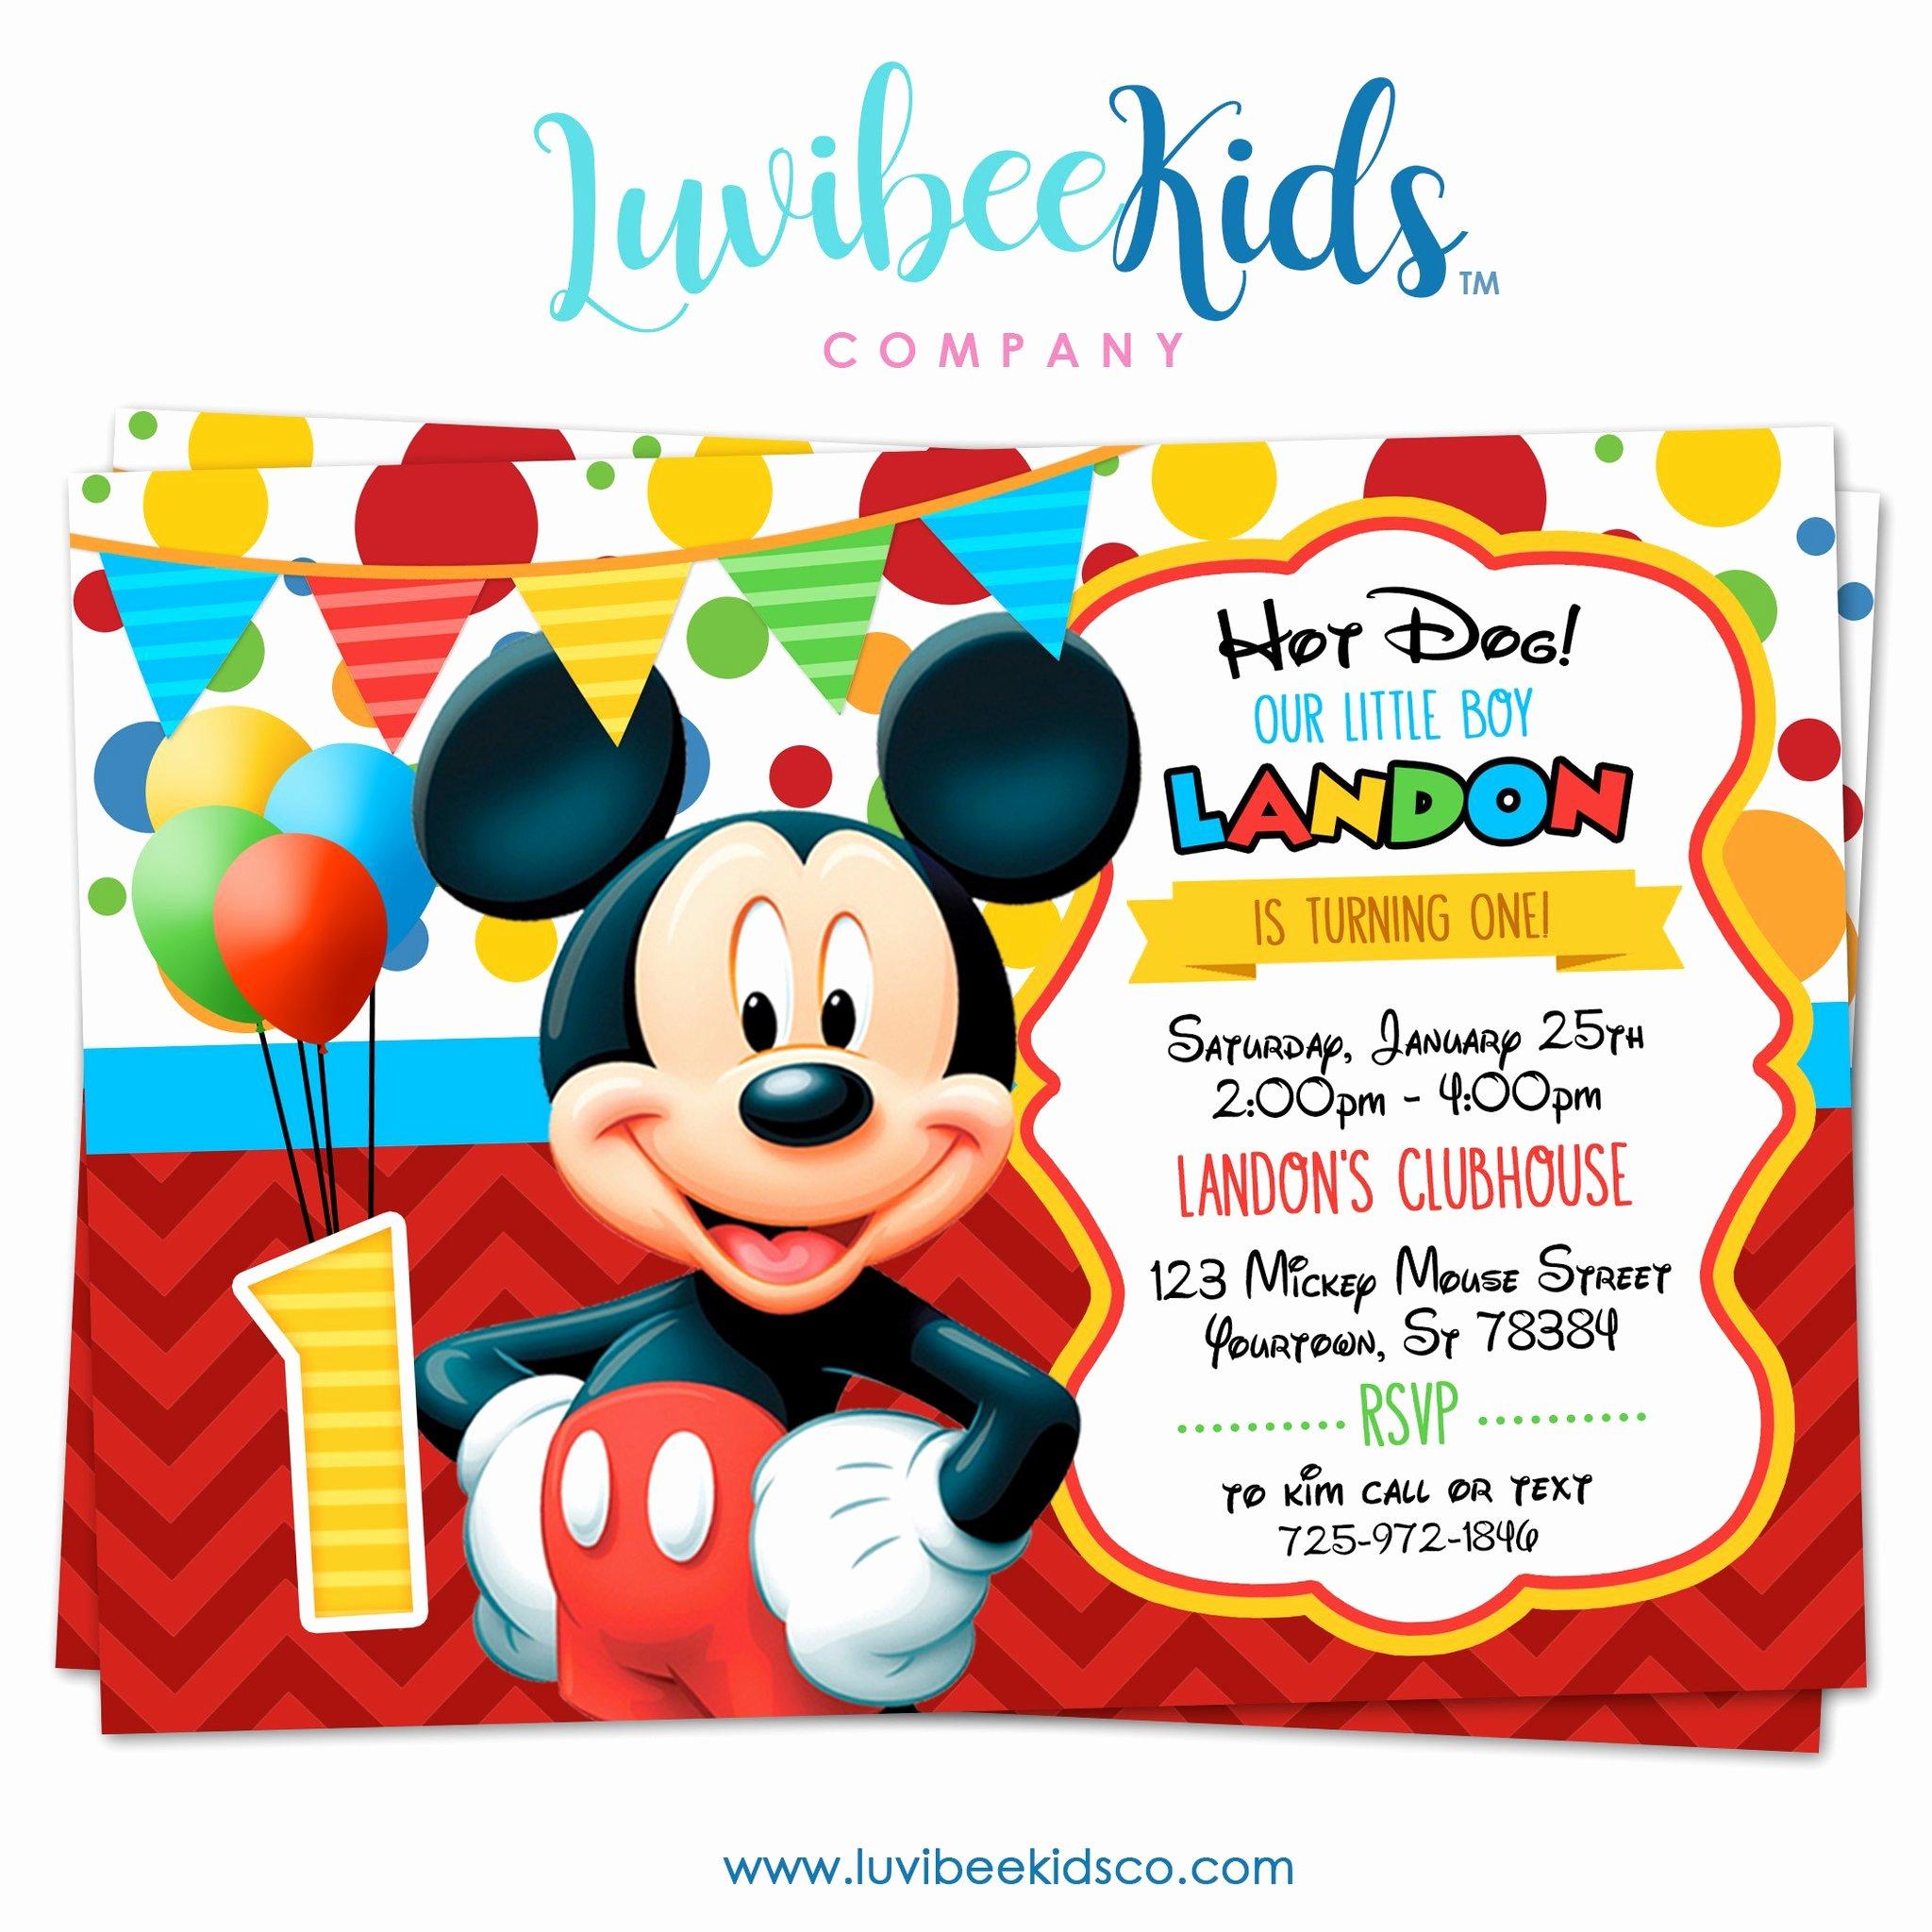 Mickey Mouse Birthday Party Invitations Elegant Mickey Mouse Birthday Invitation Printable Invite Style 01 – Luvibeekidsco